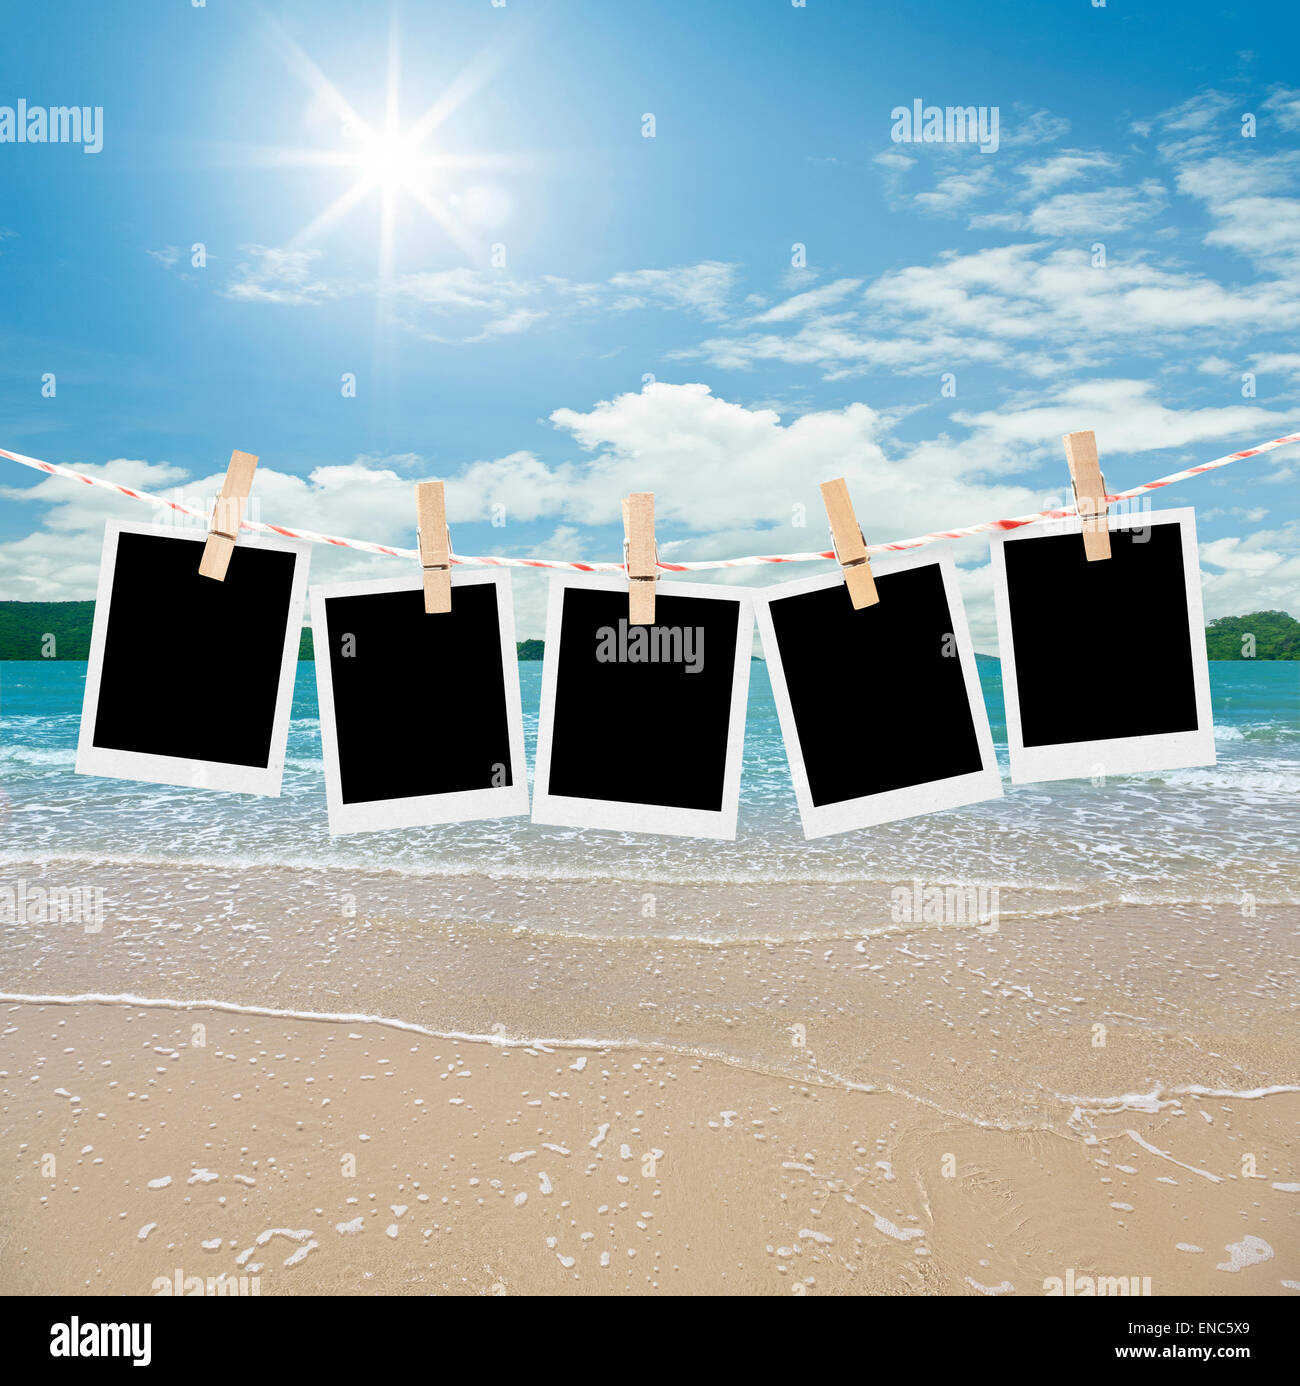 empty five photos hanging on beach - Stock Image